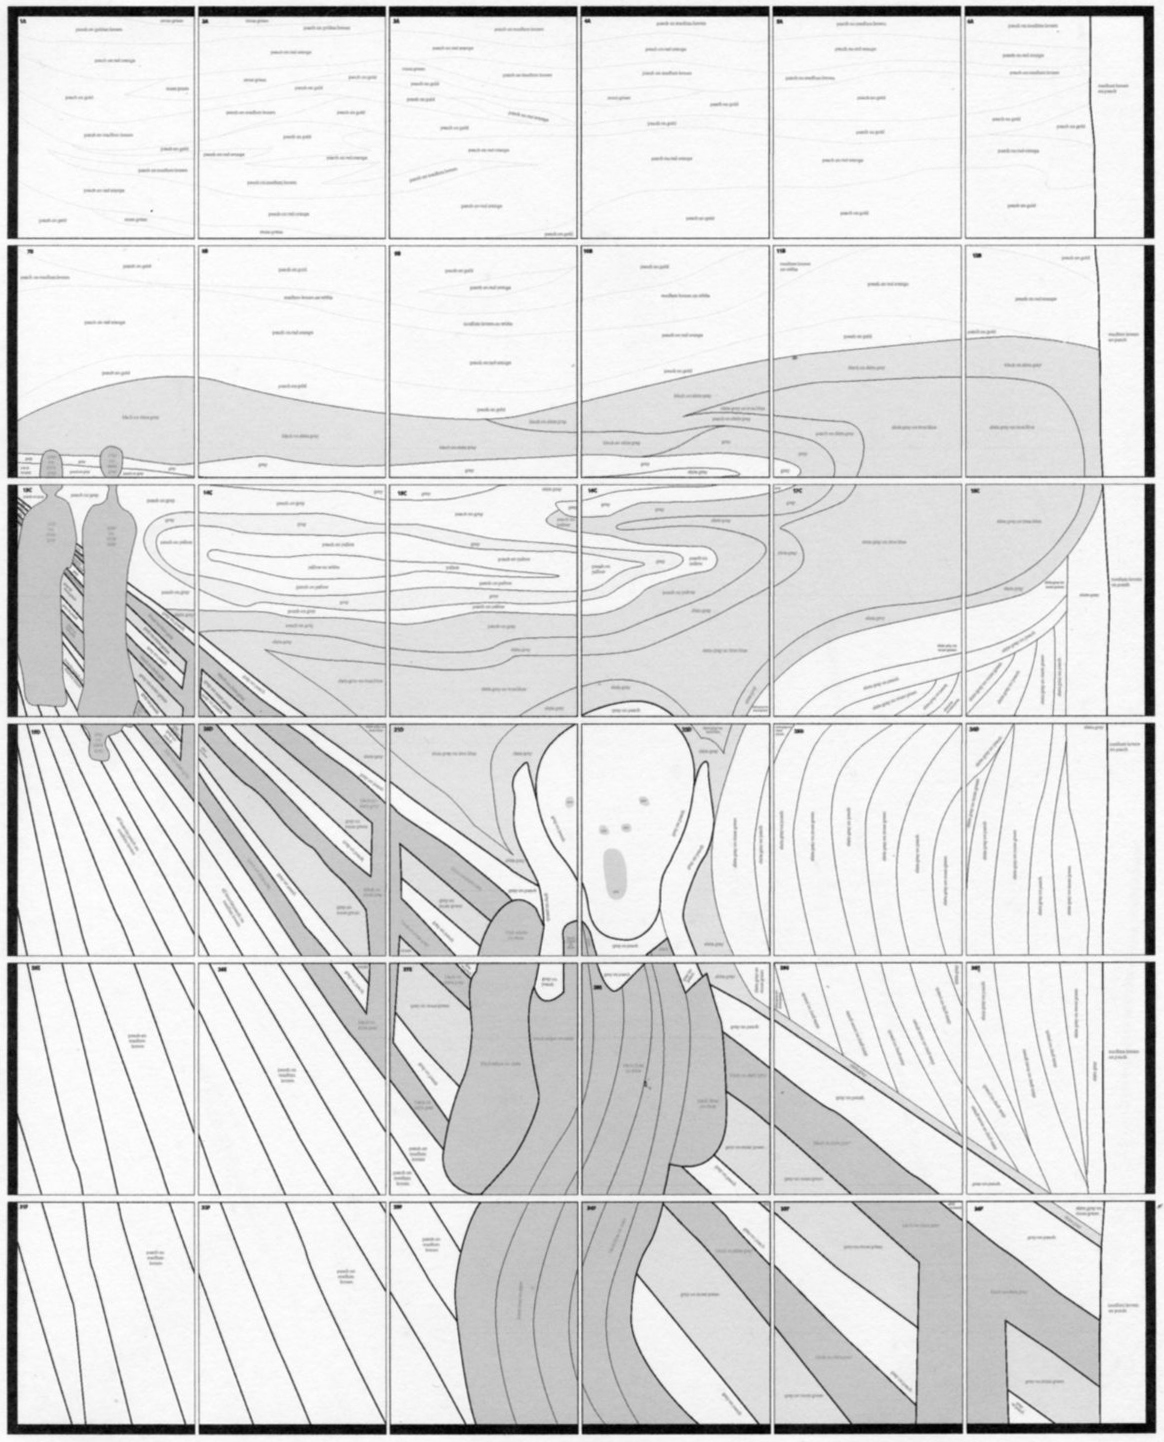 1164x1442 Munch's The Scream Mural